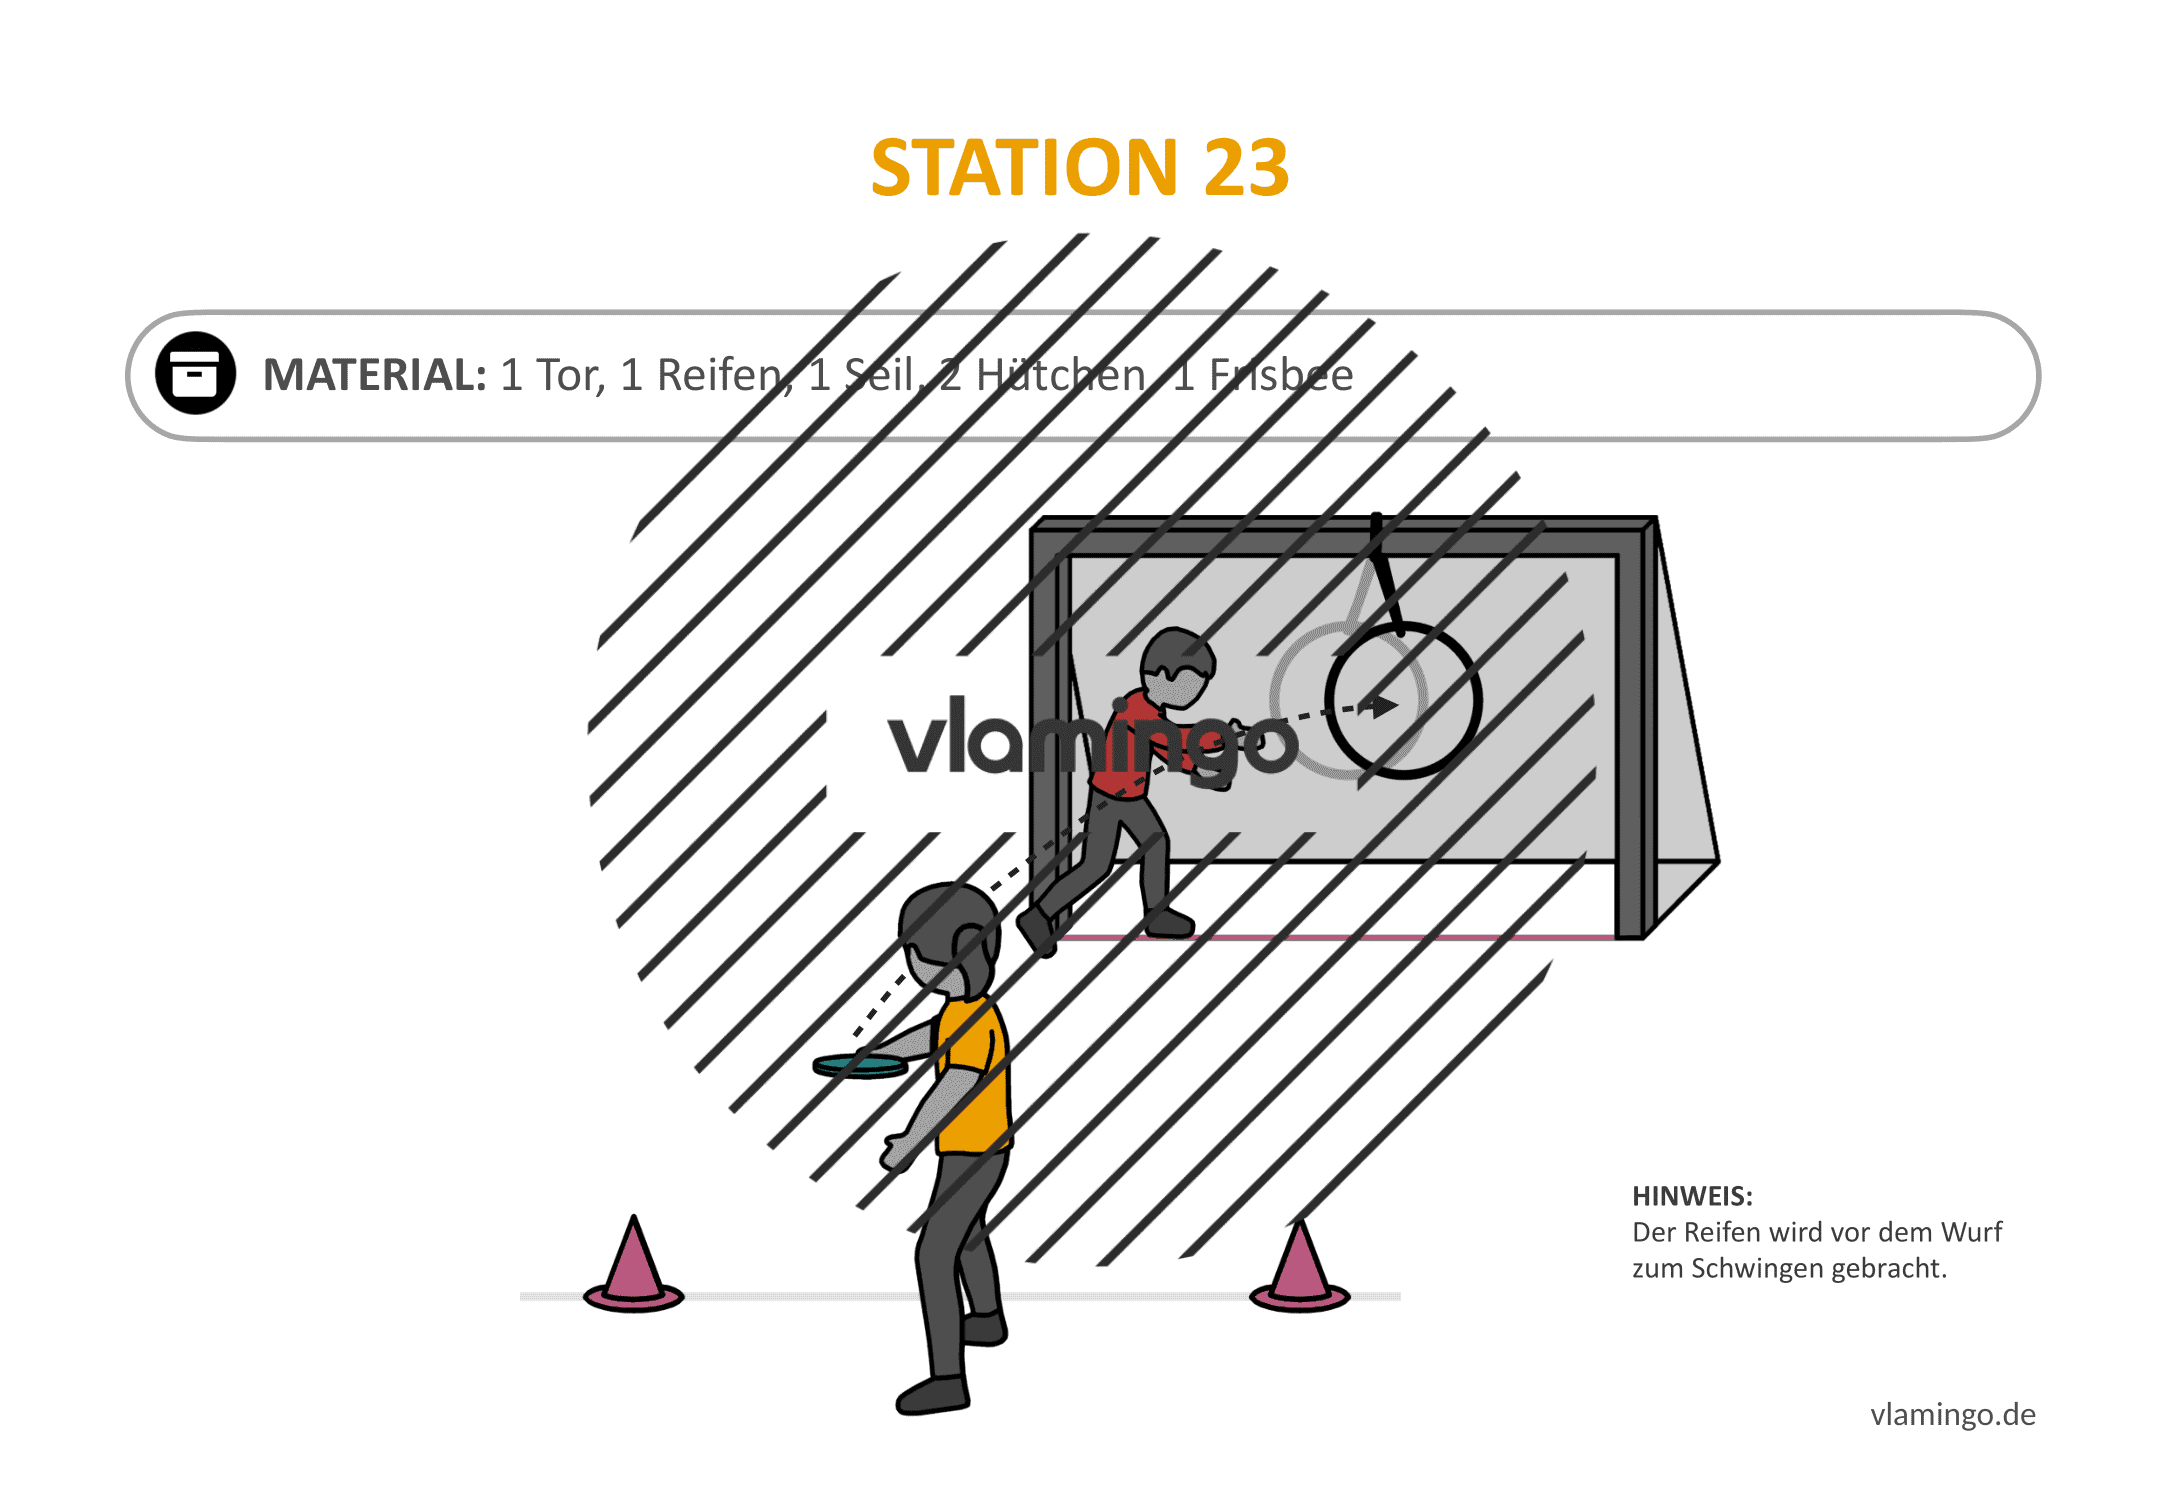 Frisbeegolf (Disc-Golf) - Station 23